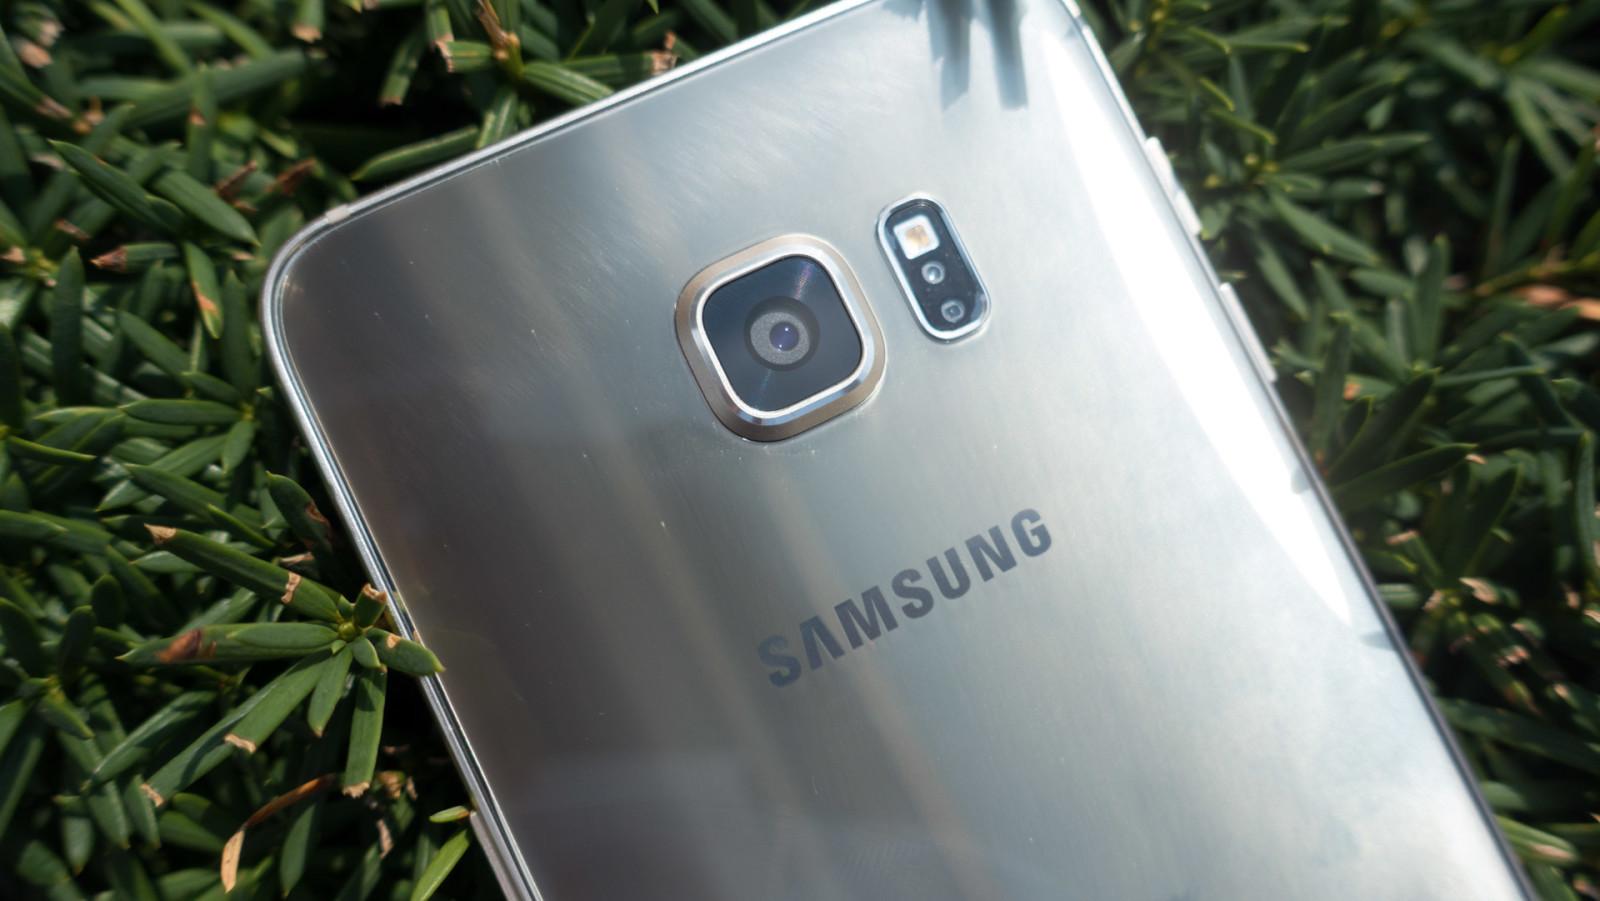 Samsung-Galaxy-S6-Edge-plus-Camera-Tips-Tricks-AH-4-1600x901